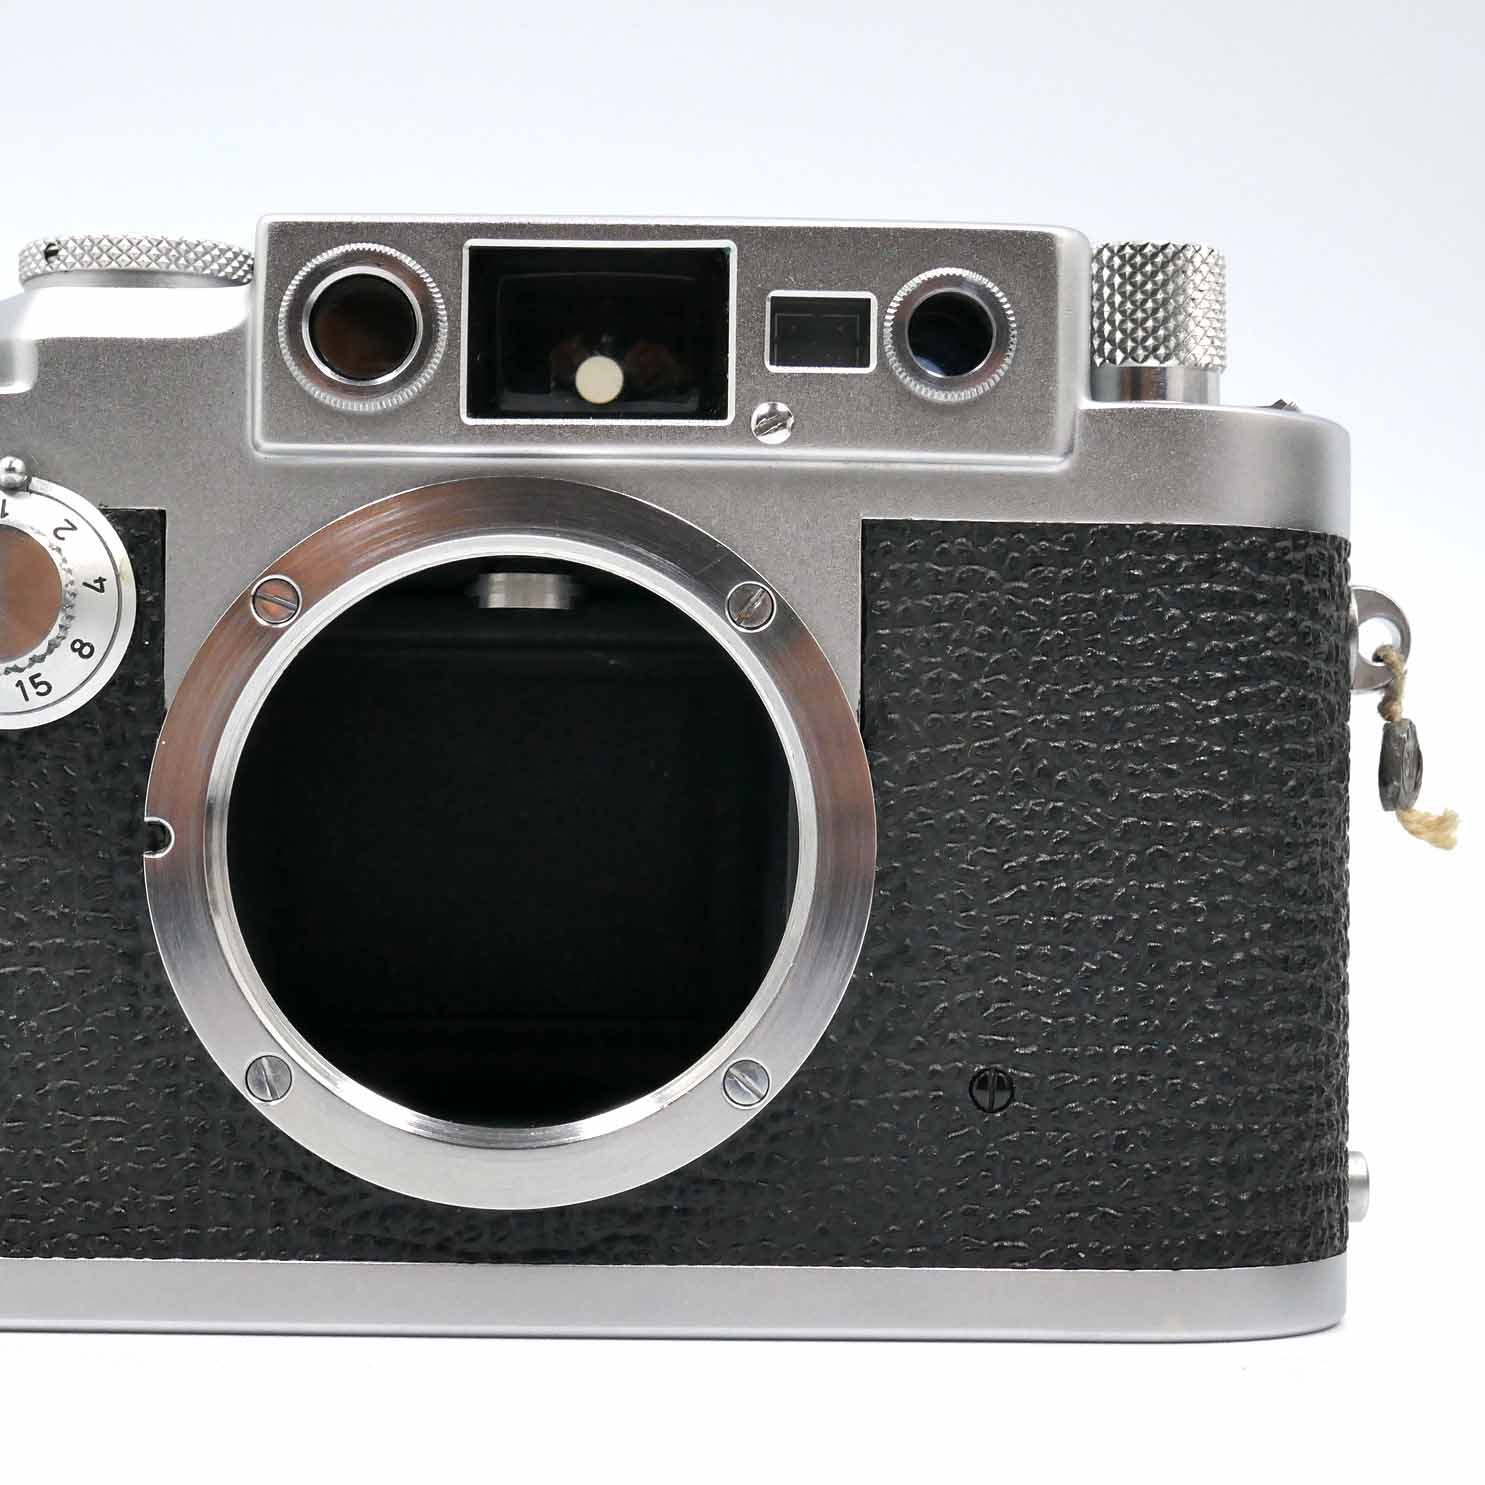 clean-cameras-Leica-IIIg+Summicron-2.0-5cm13